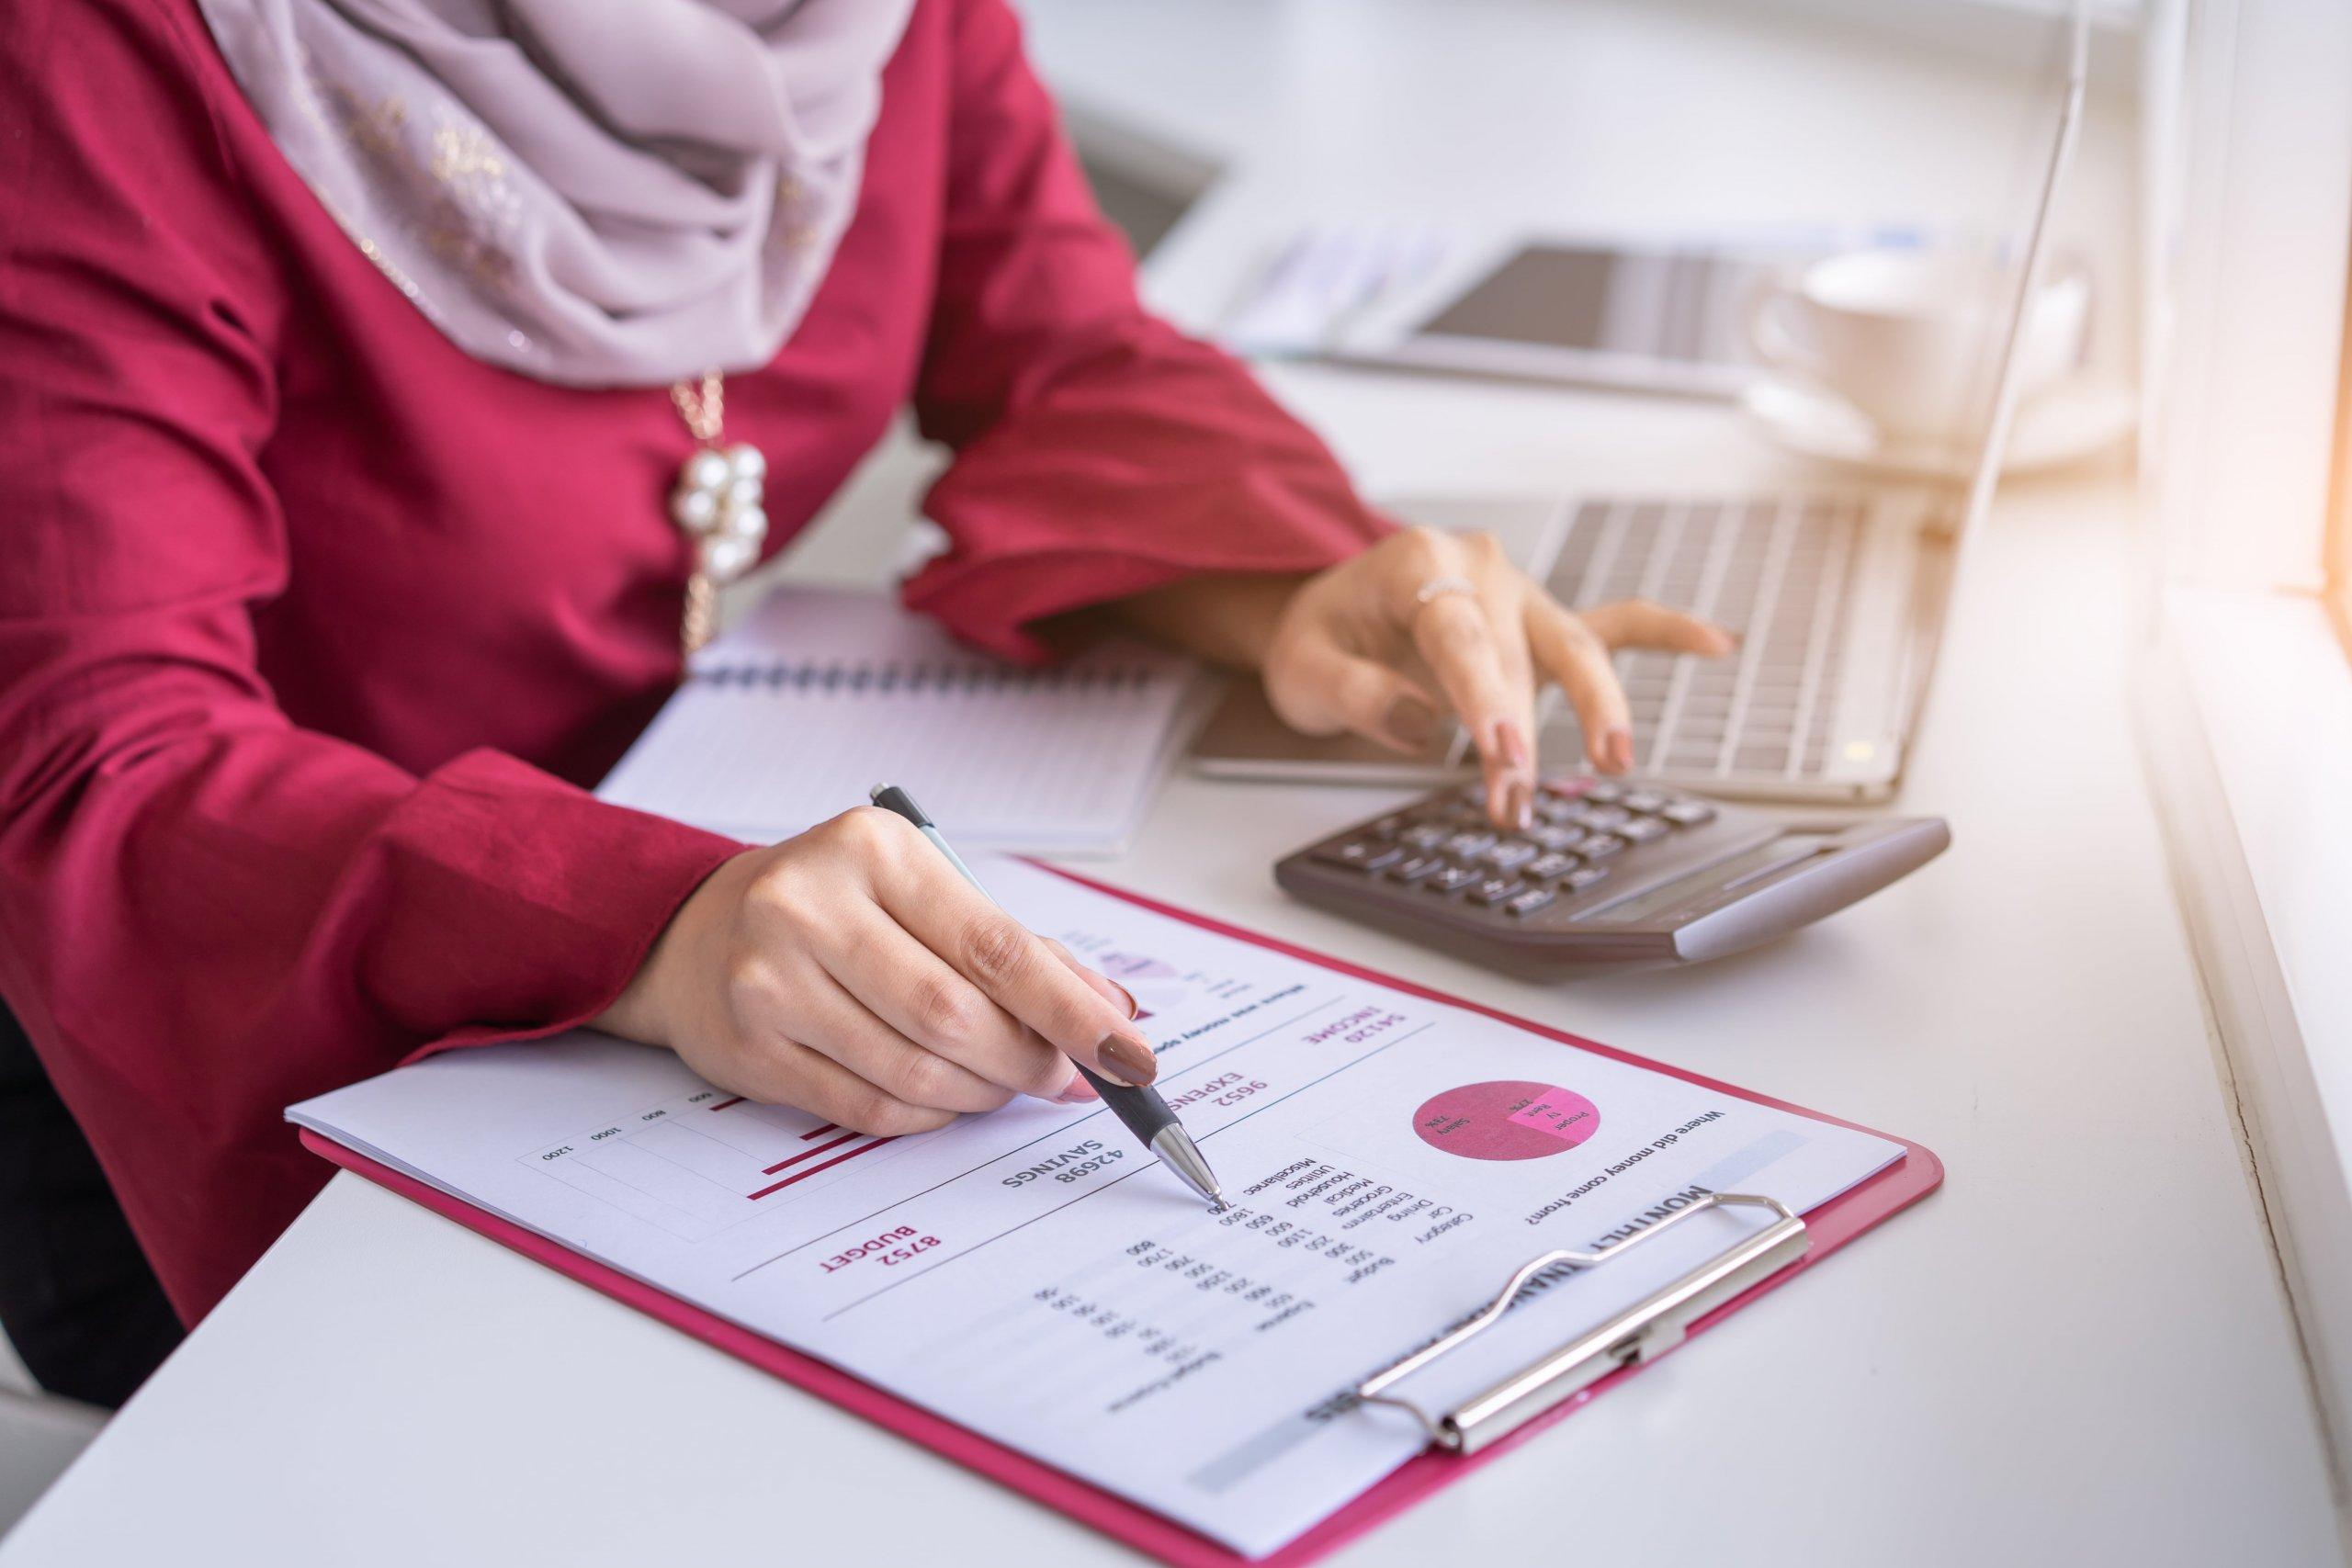 ressecion-proof your finances